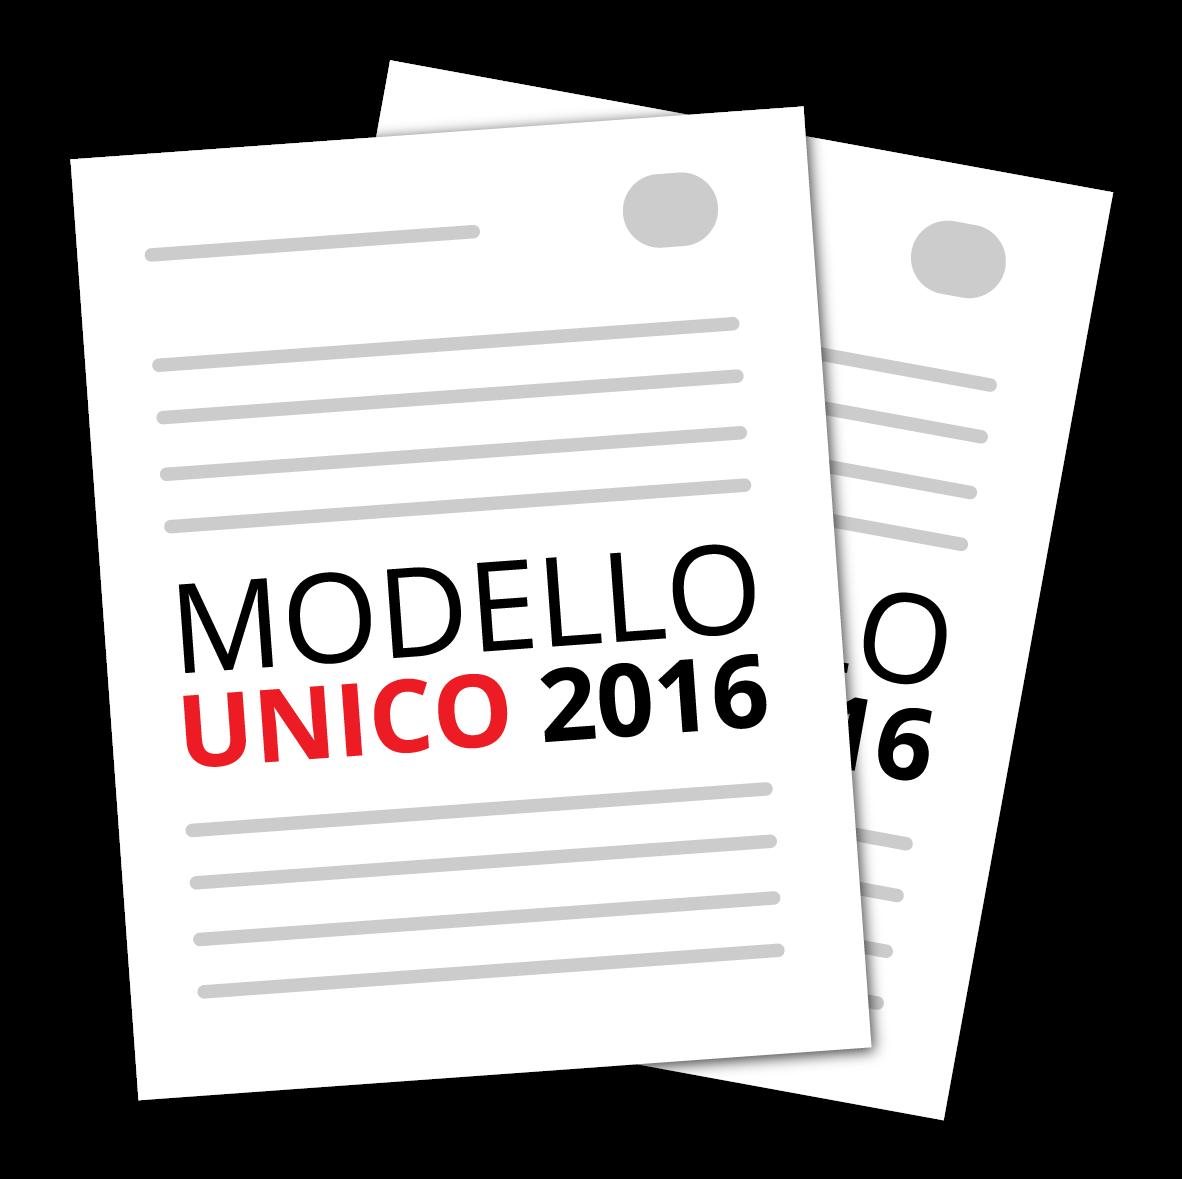 Modello_2016